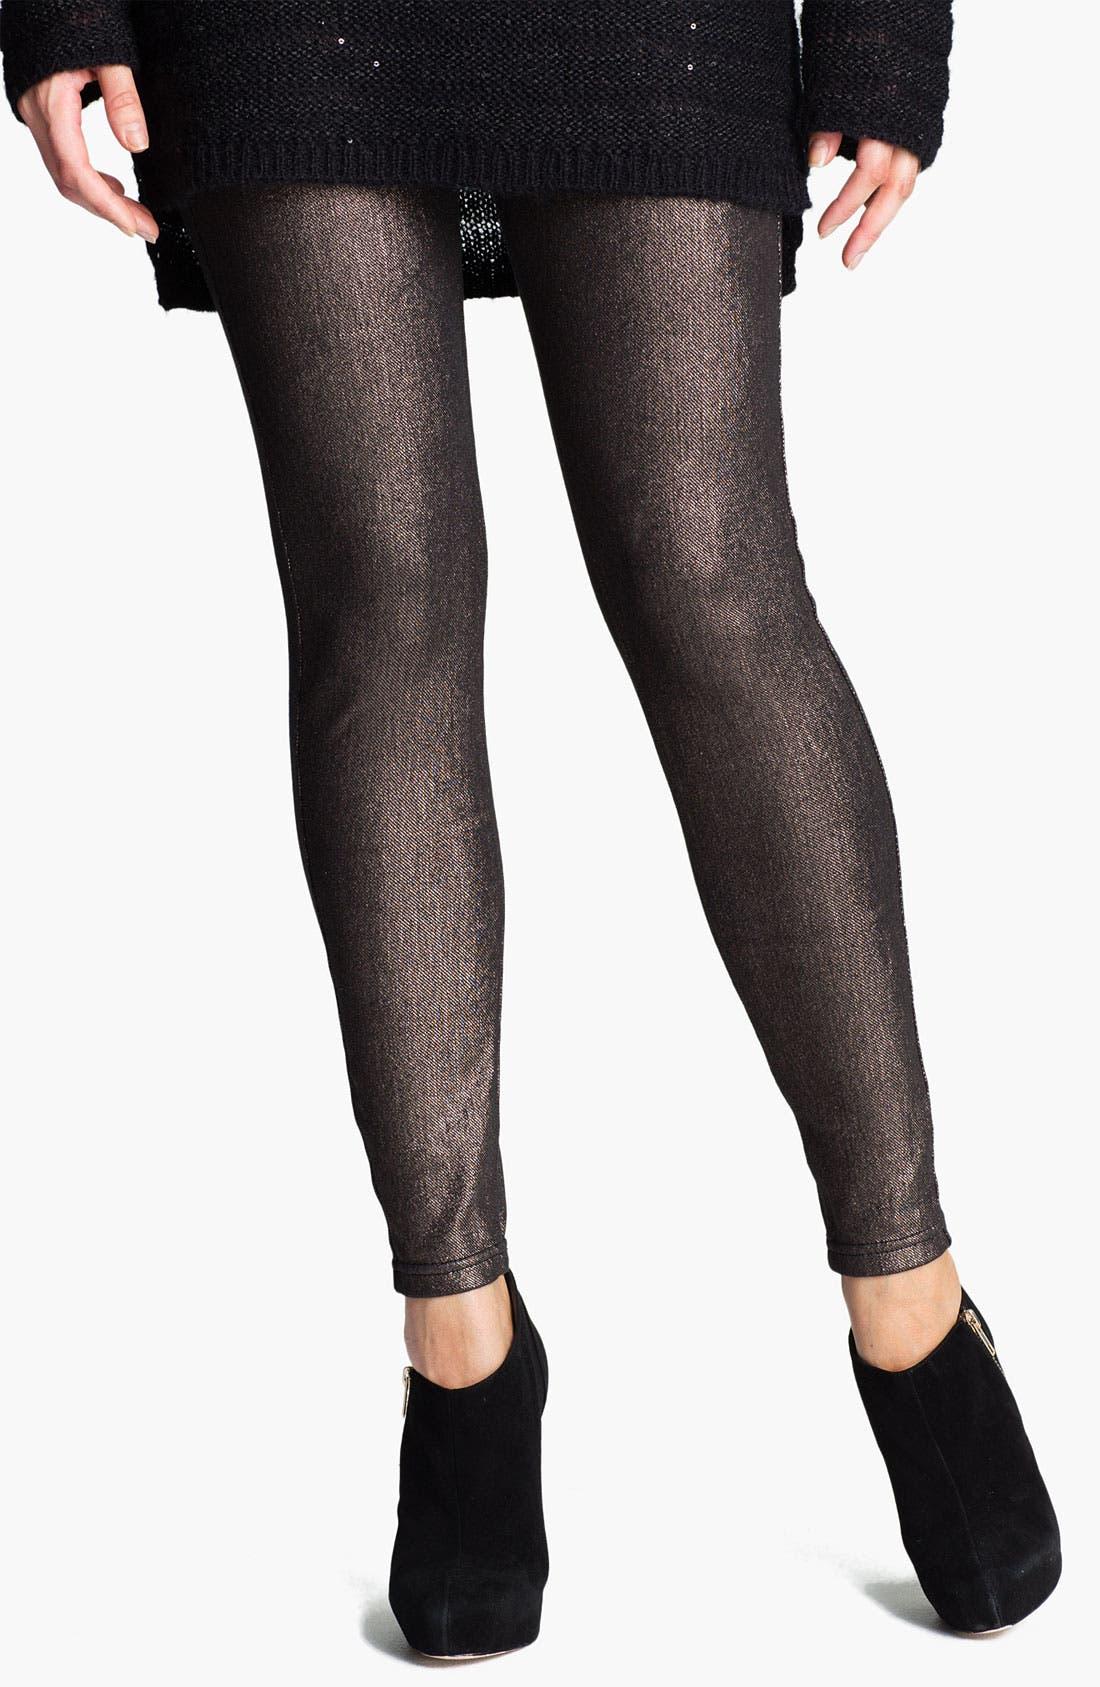 Alternate Image 1 Selected - Hue Foil Print Jeans Leggings